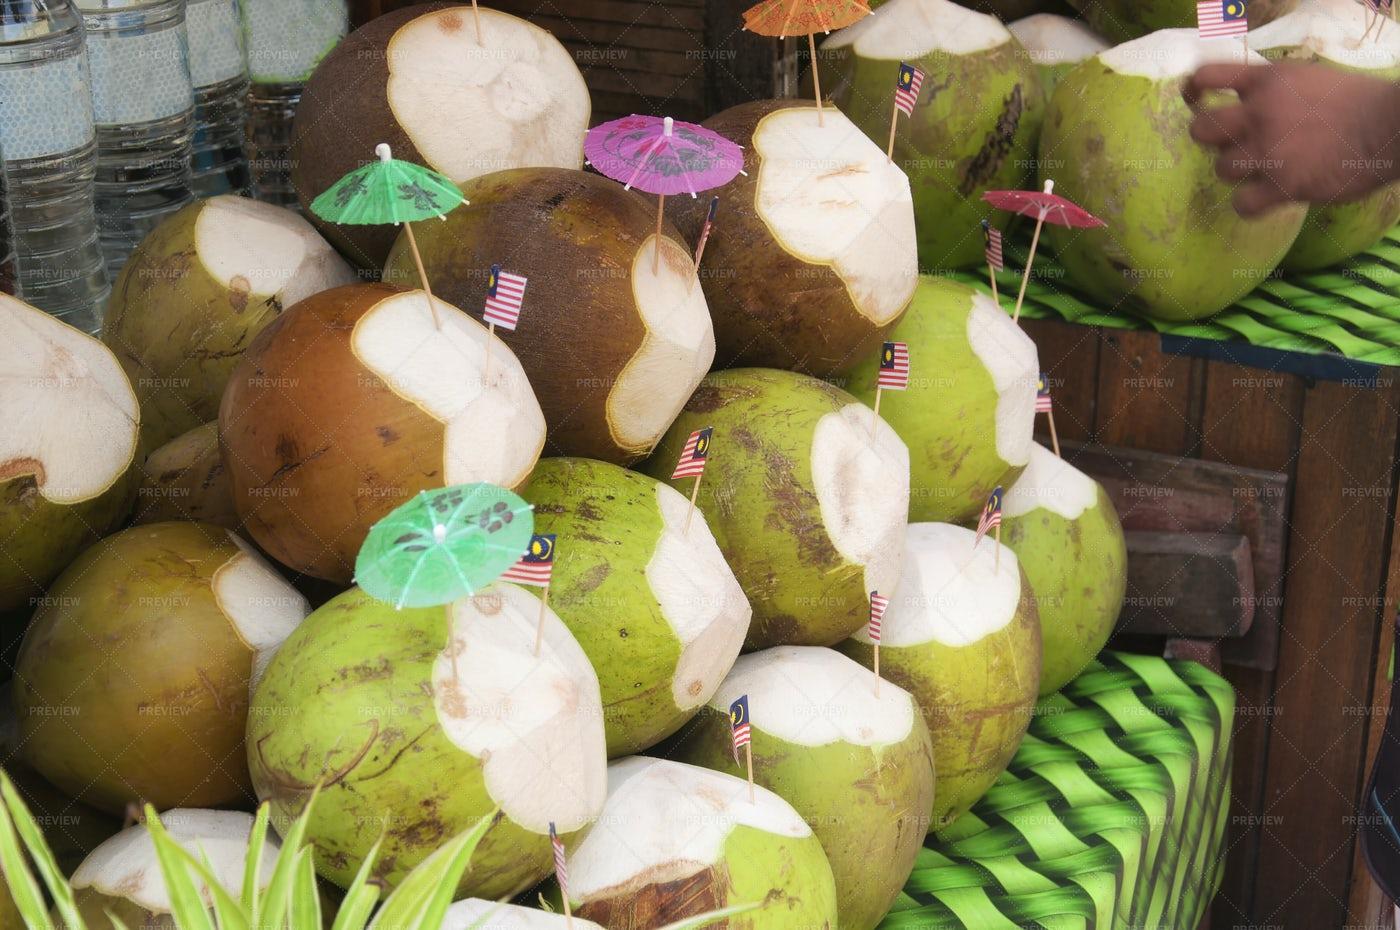 Coconut Drinks In Market: Stock Photos